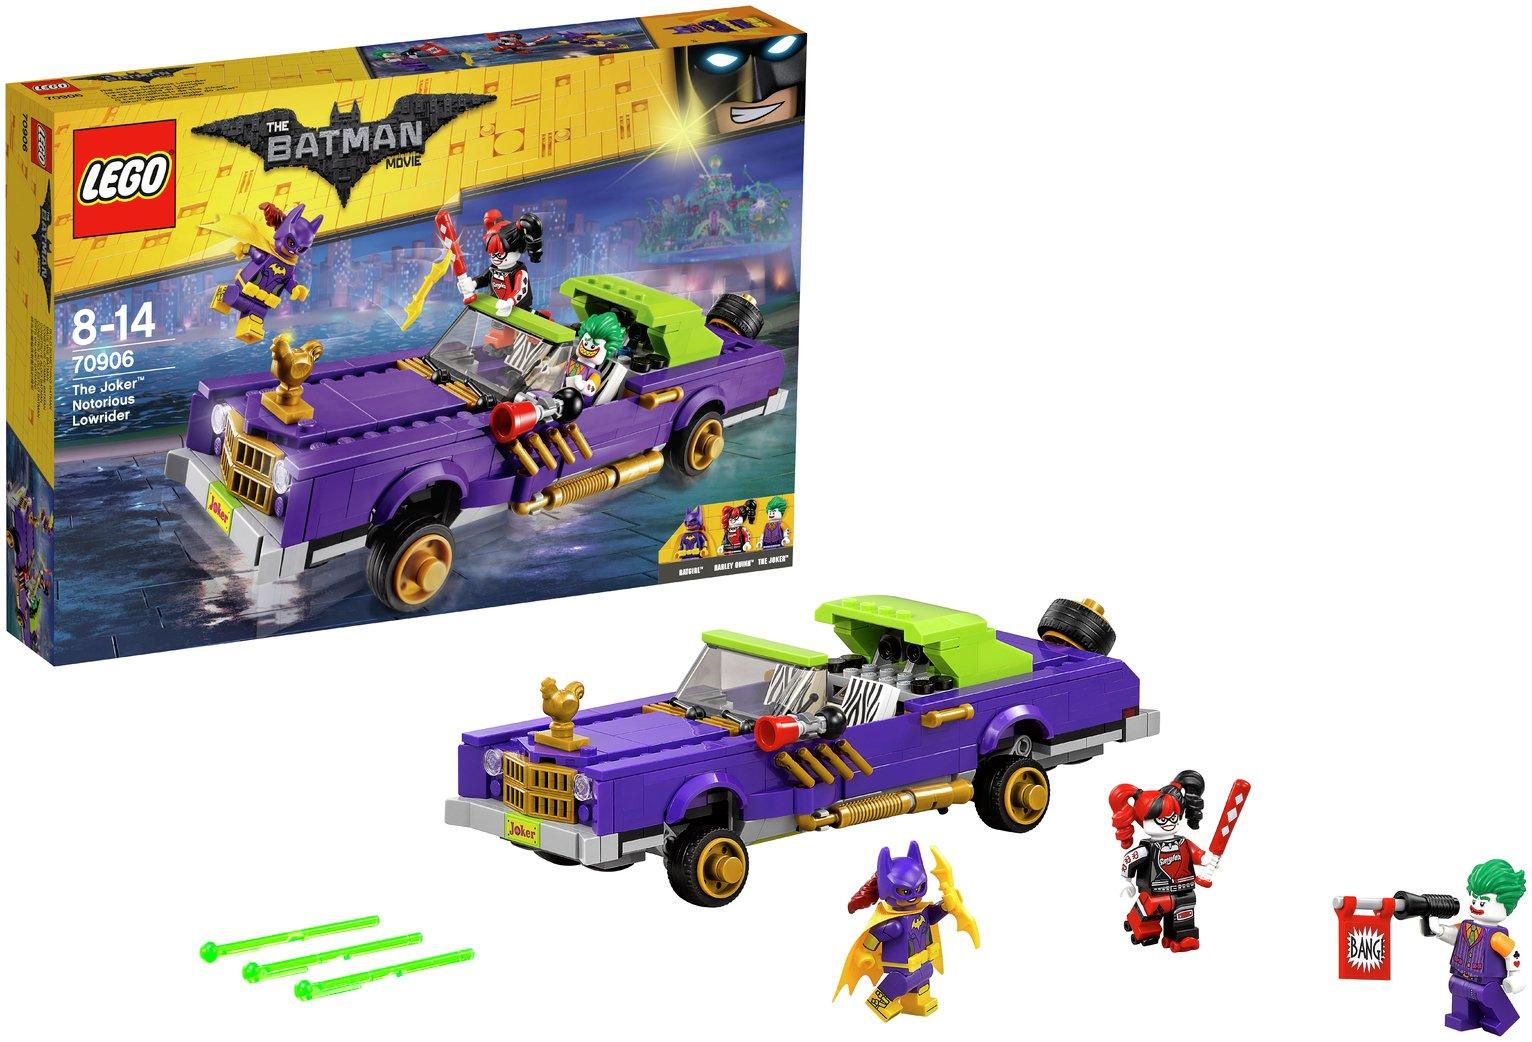 LEGO The Batman Movie Joker Lowrider - 70906